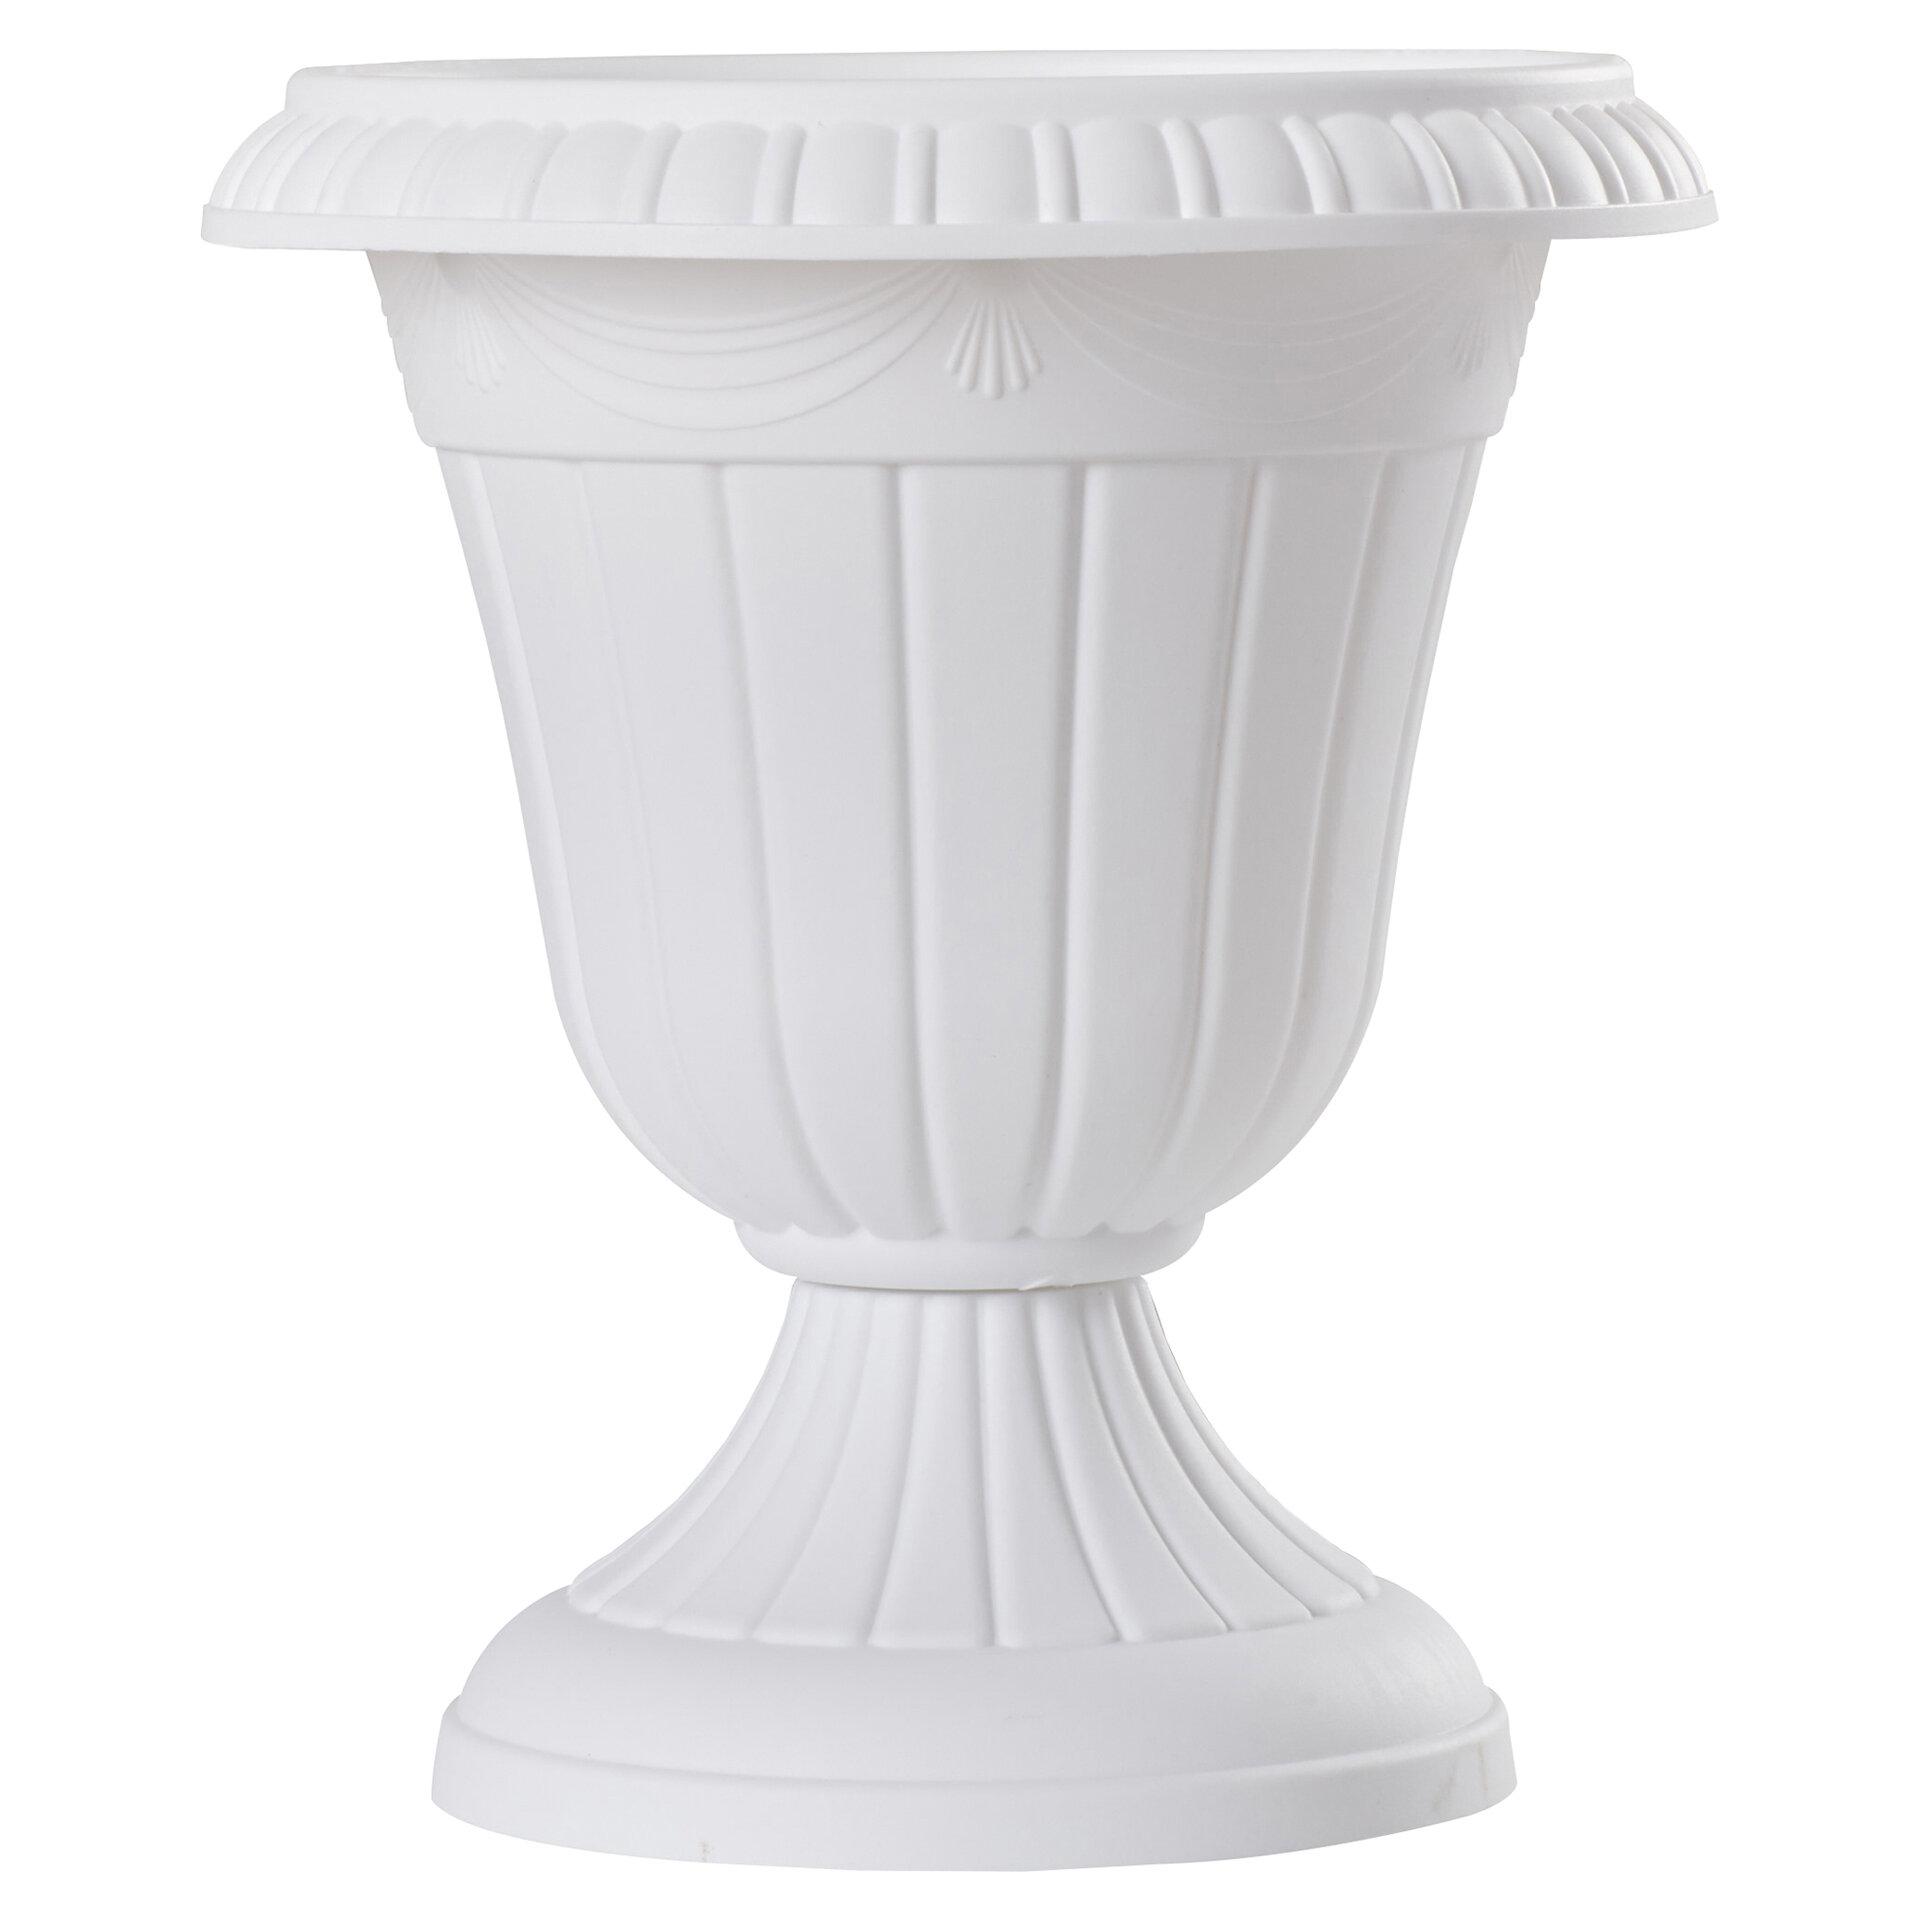 Anouk Classic Traditional Plastic Urn Planter